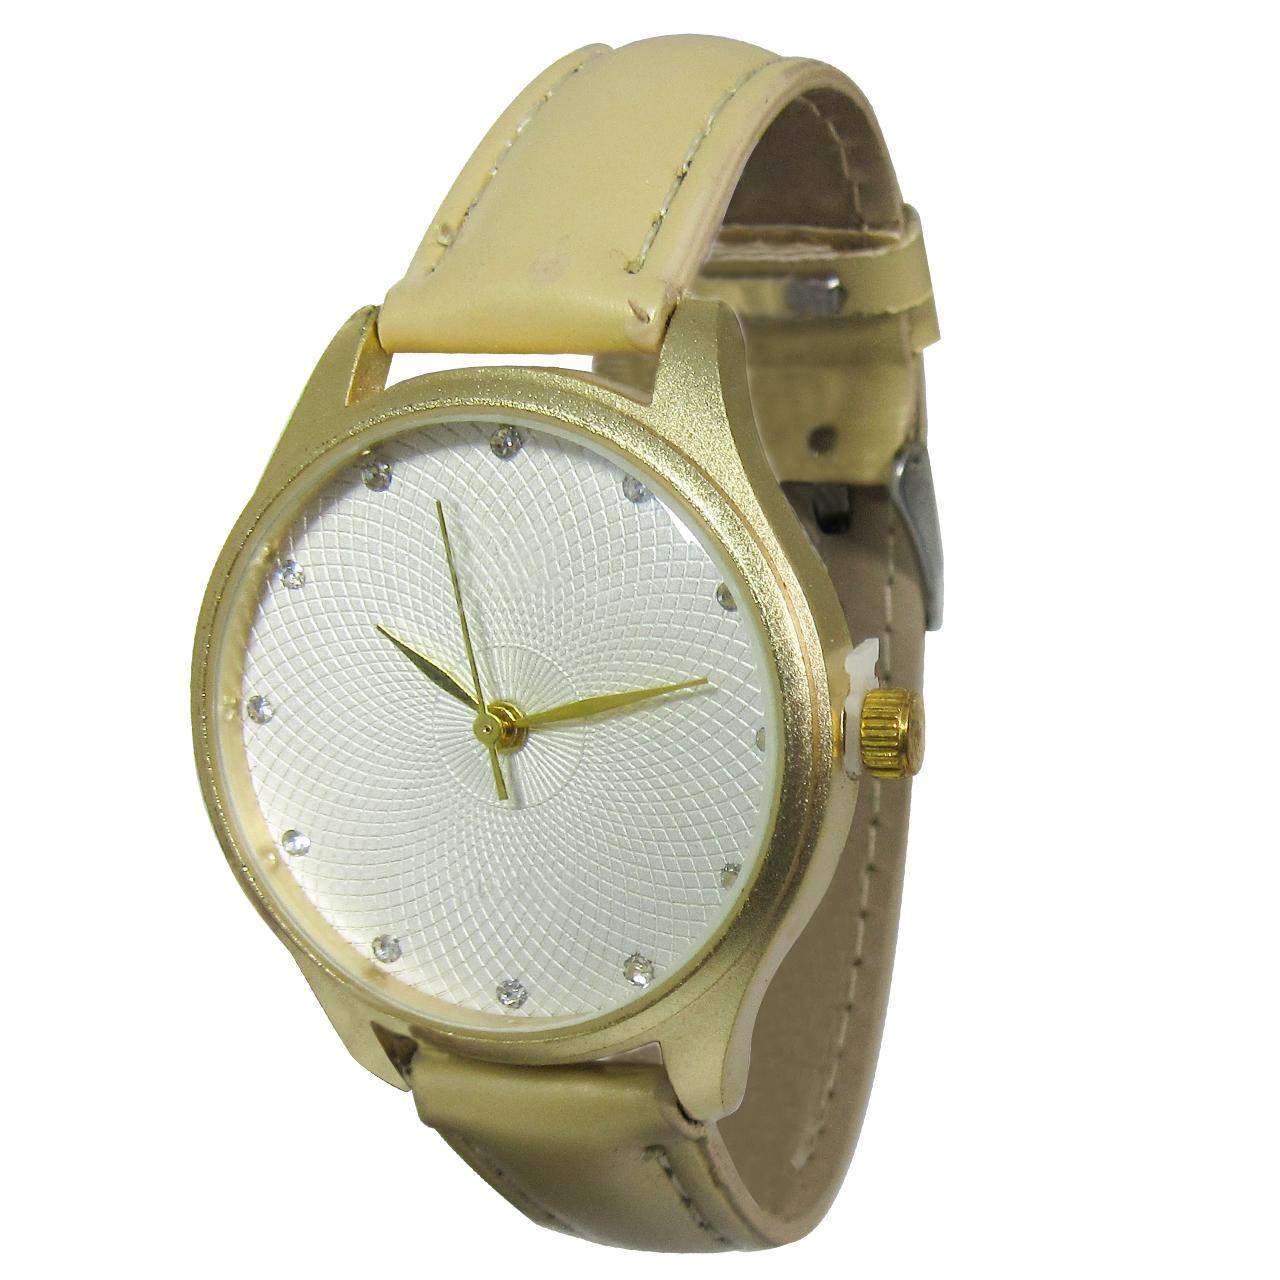 ساعت زنانه برند مدل CK 231 Gold